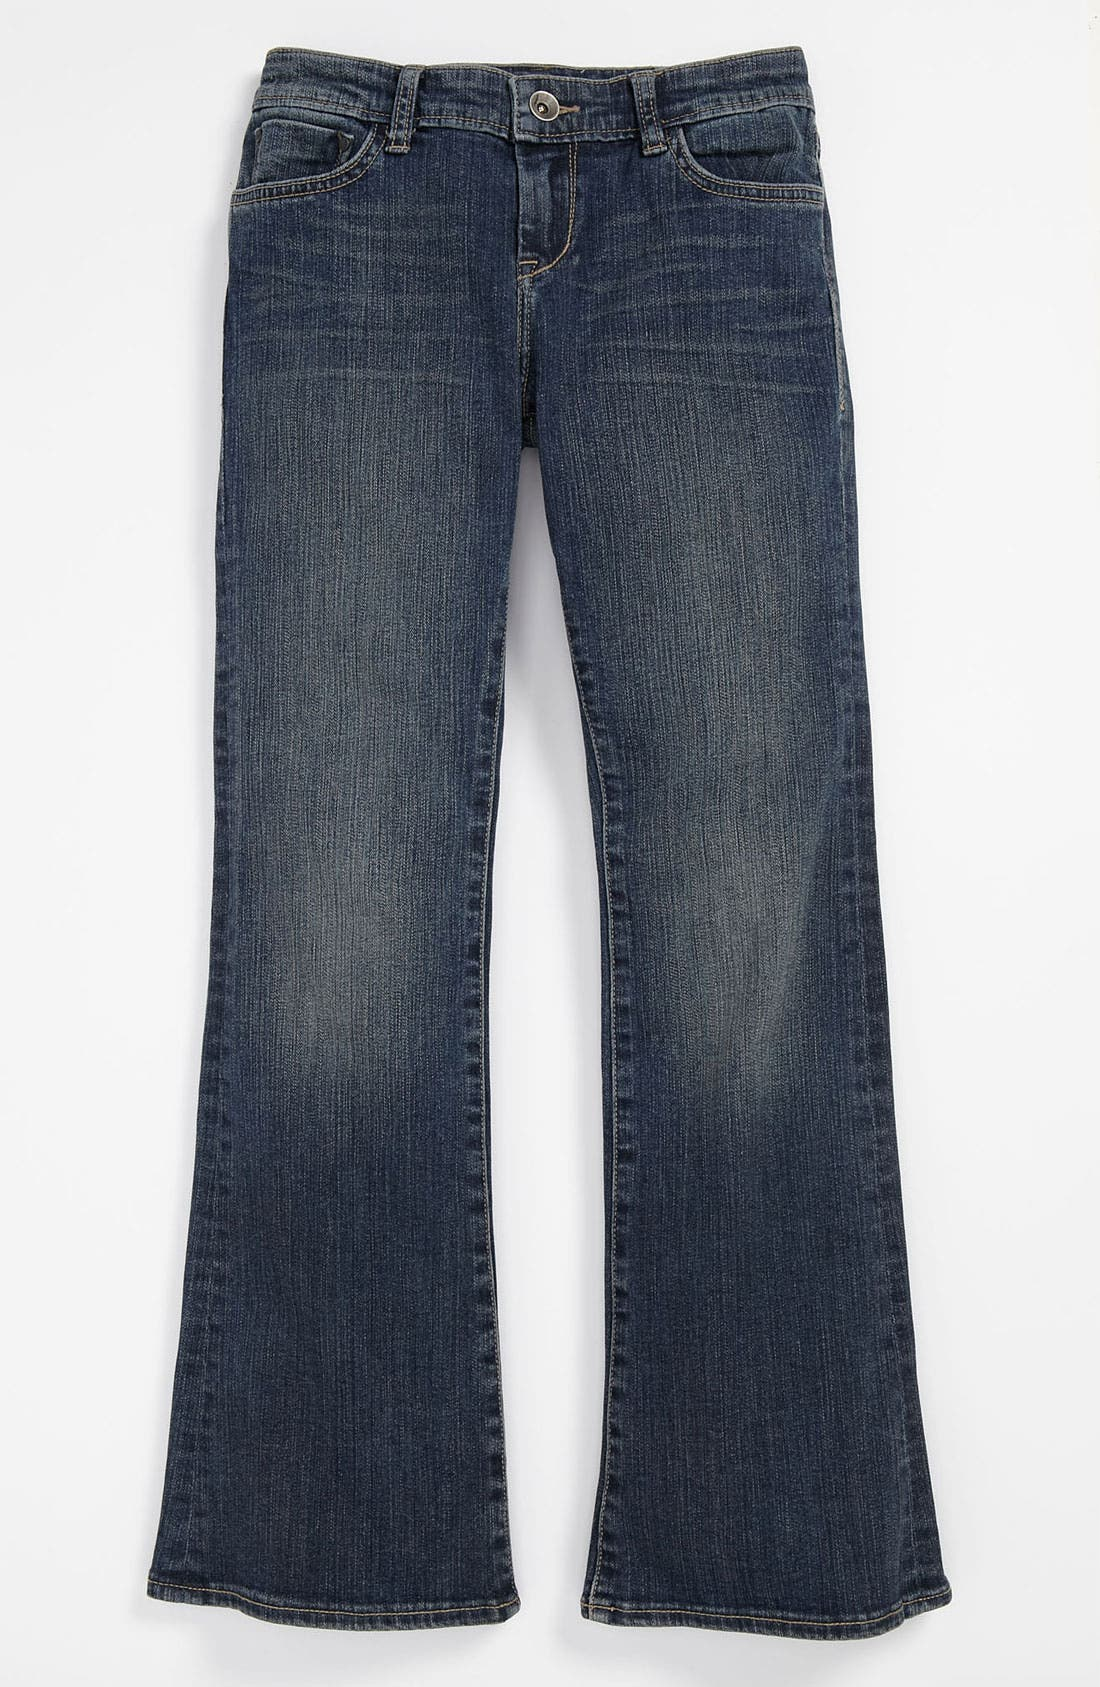 Alternate Image 2  - !iT JEANS Bootcut Jeans (Big Girls)